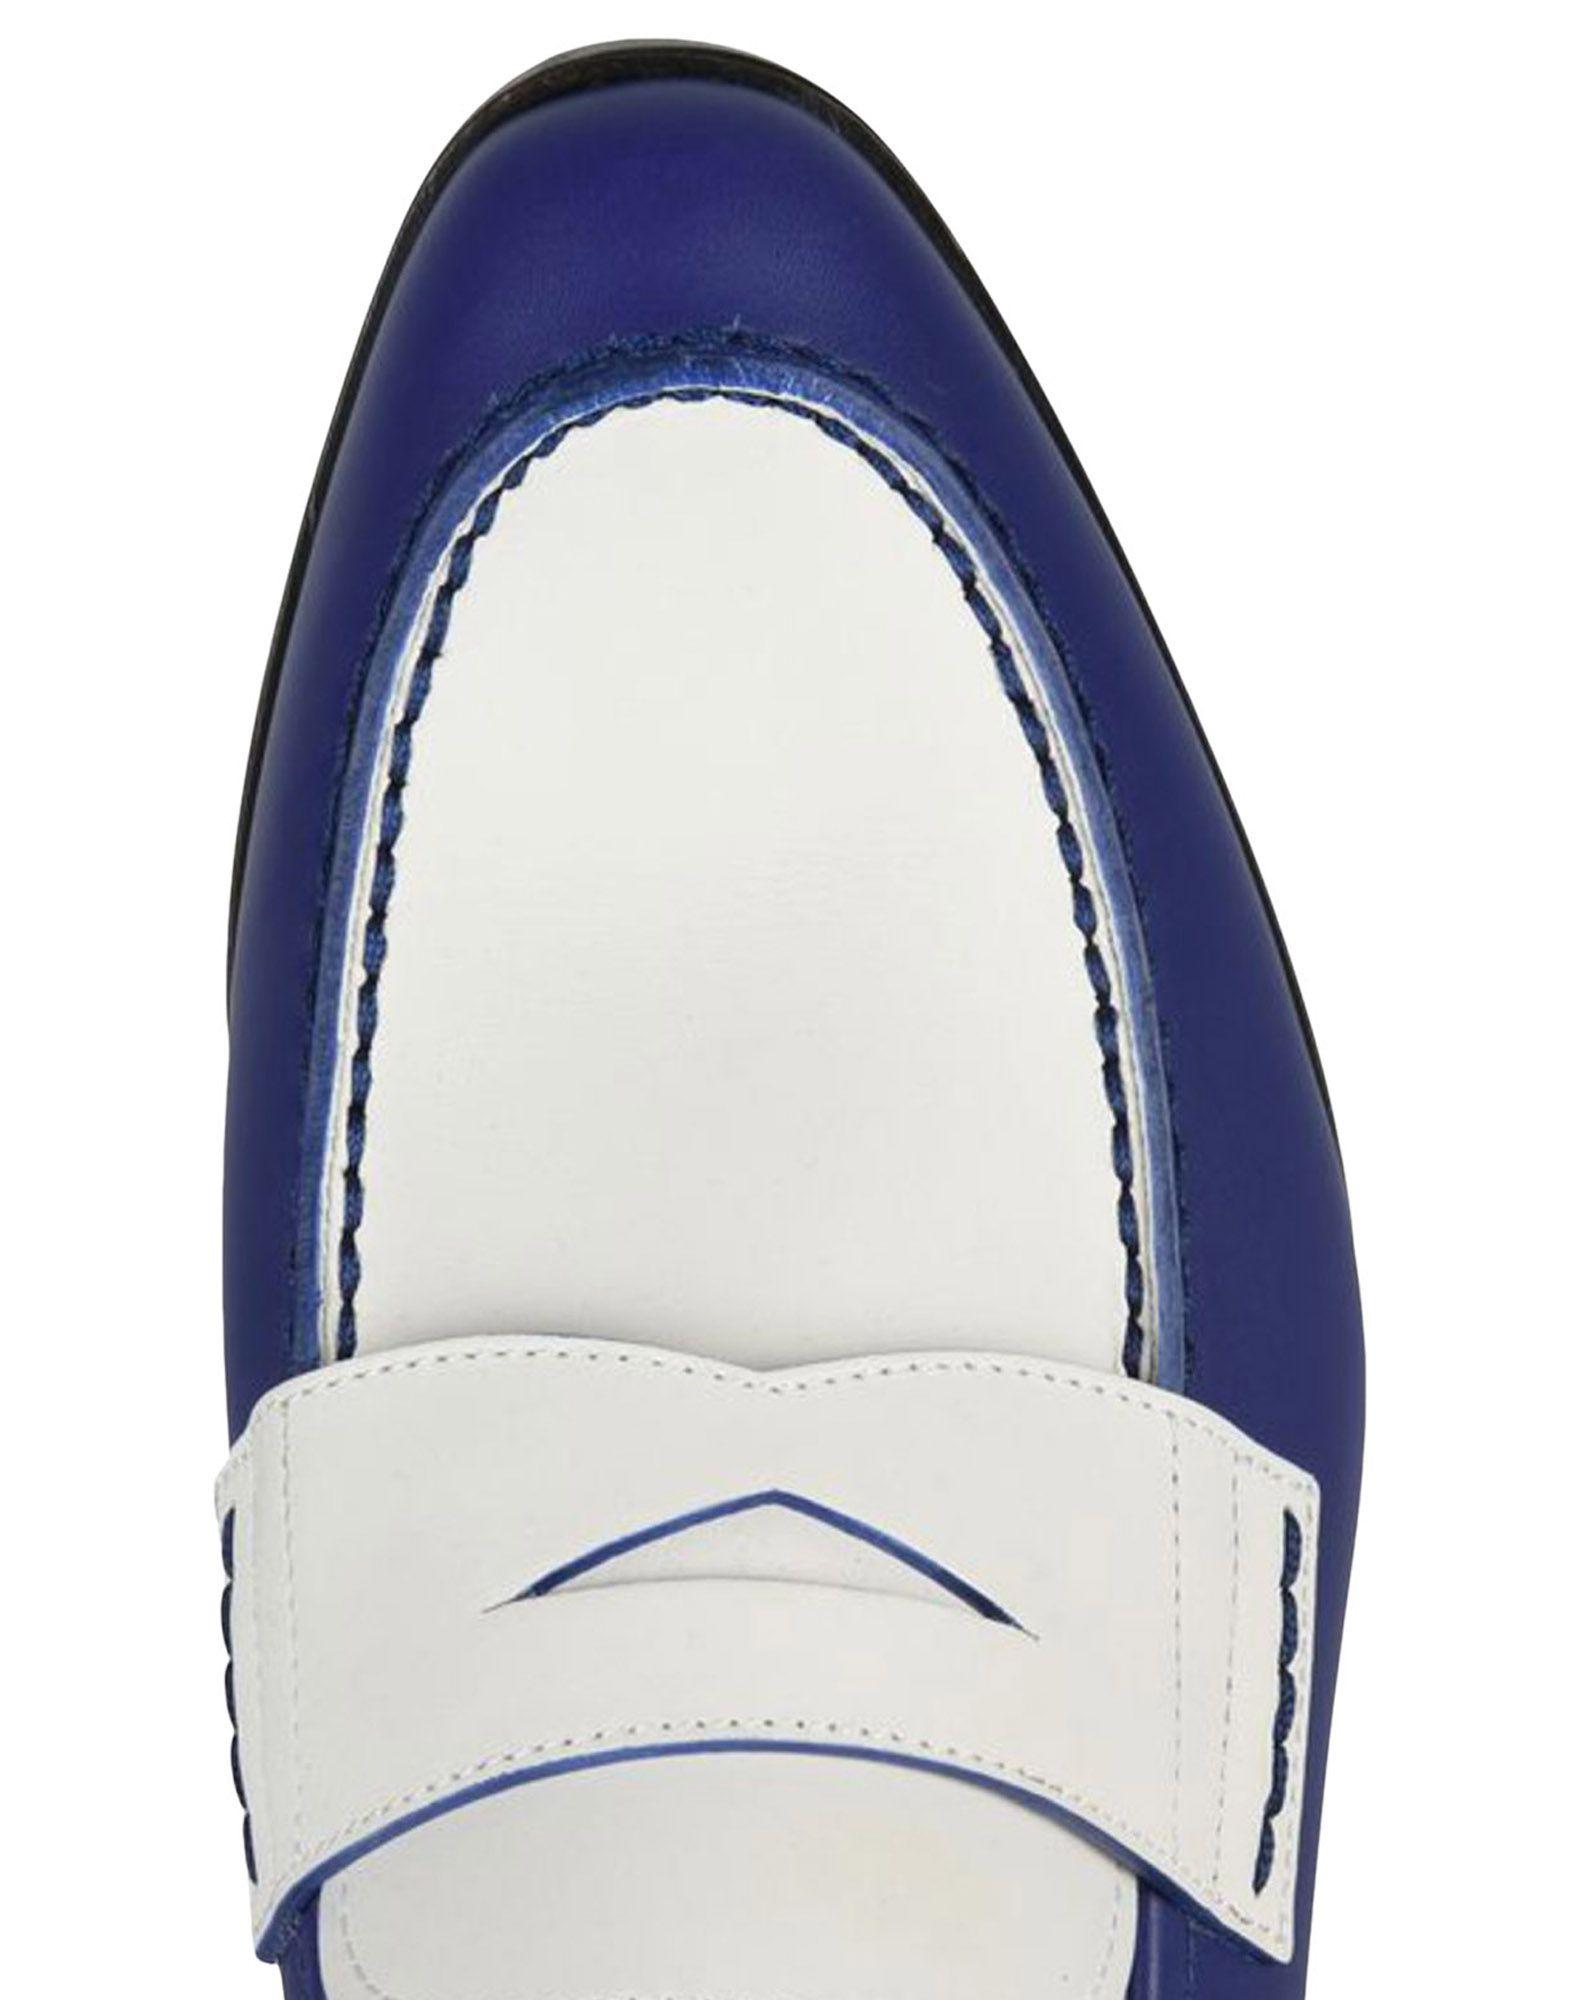 Stilvolle Stilvolle Stilvolle billige Schuhe Giorgio Armani Mokassins Damen  11446654UG fbe065